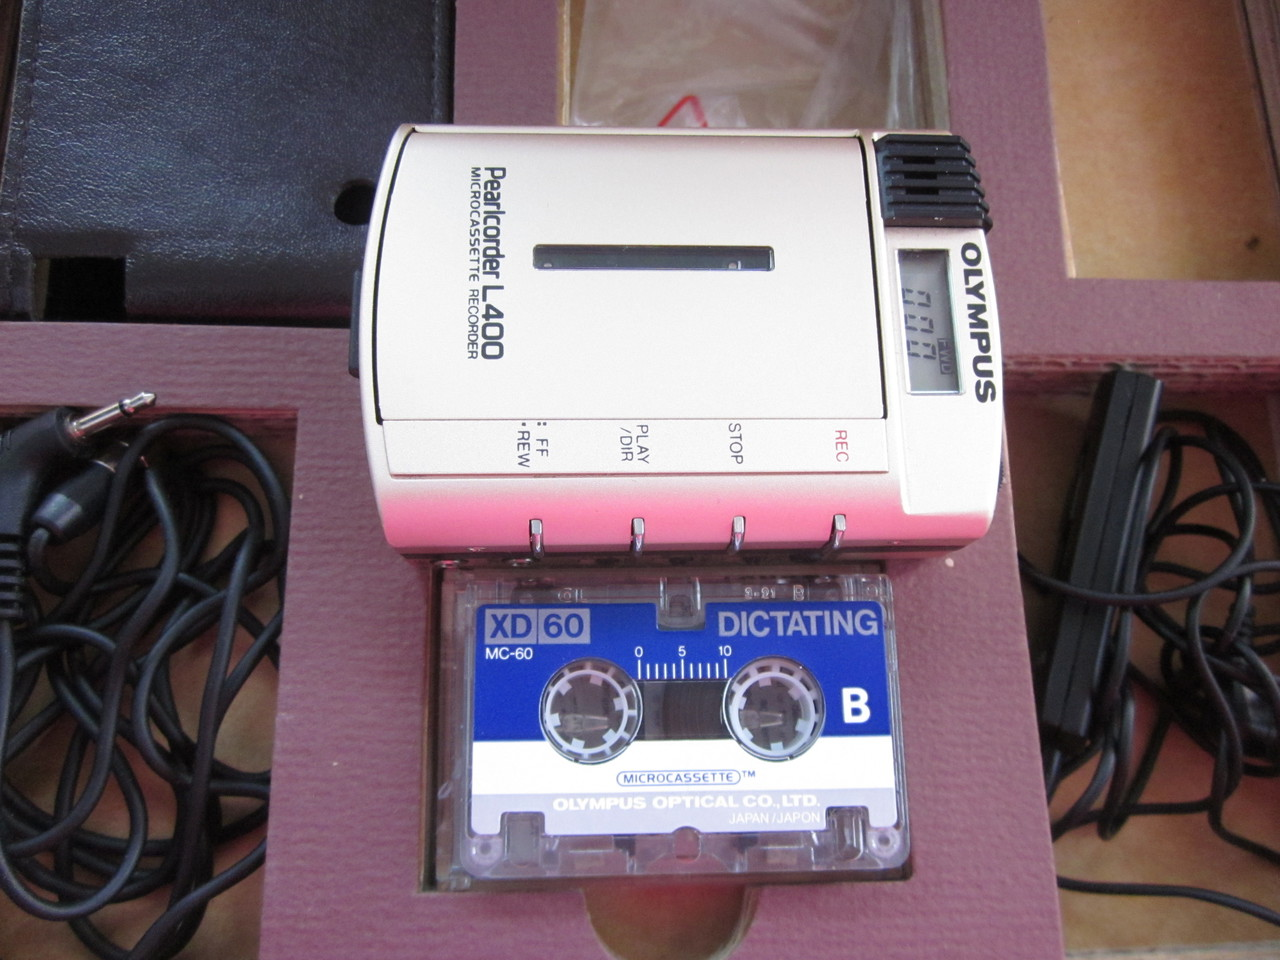 olympus pearlcorder l400 microcassetten recorder. Black Bedroom Furniture Sets. Home Design Ideas